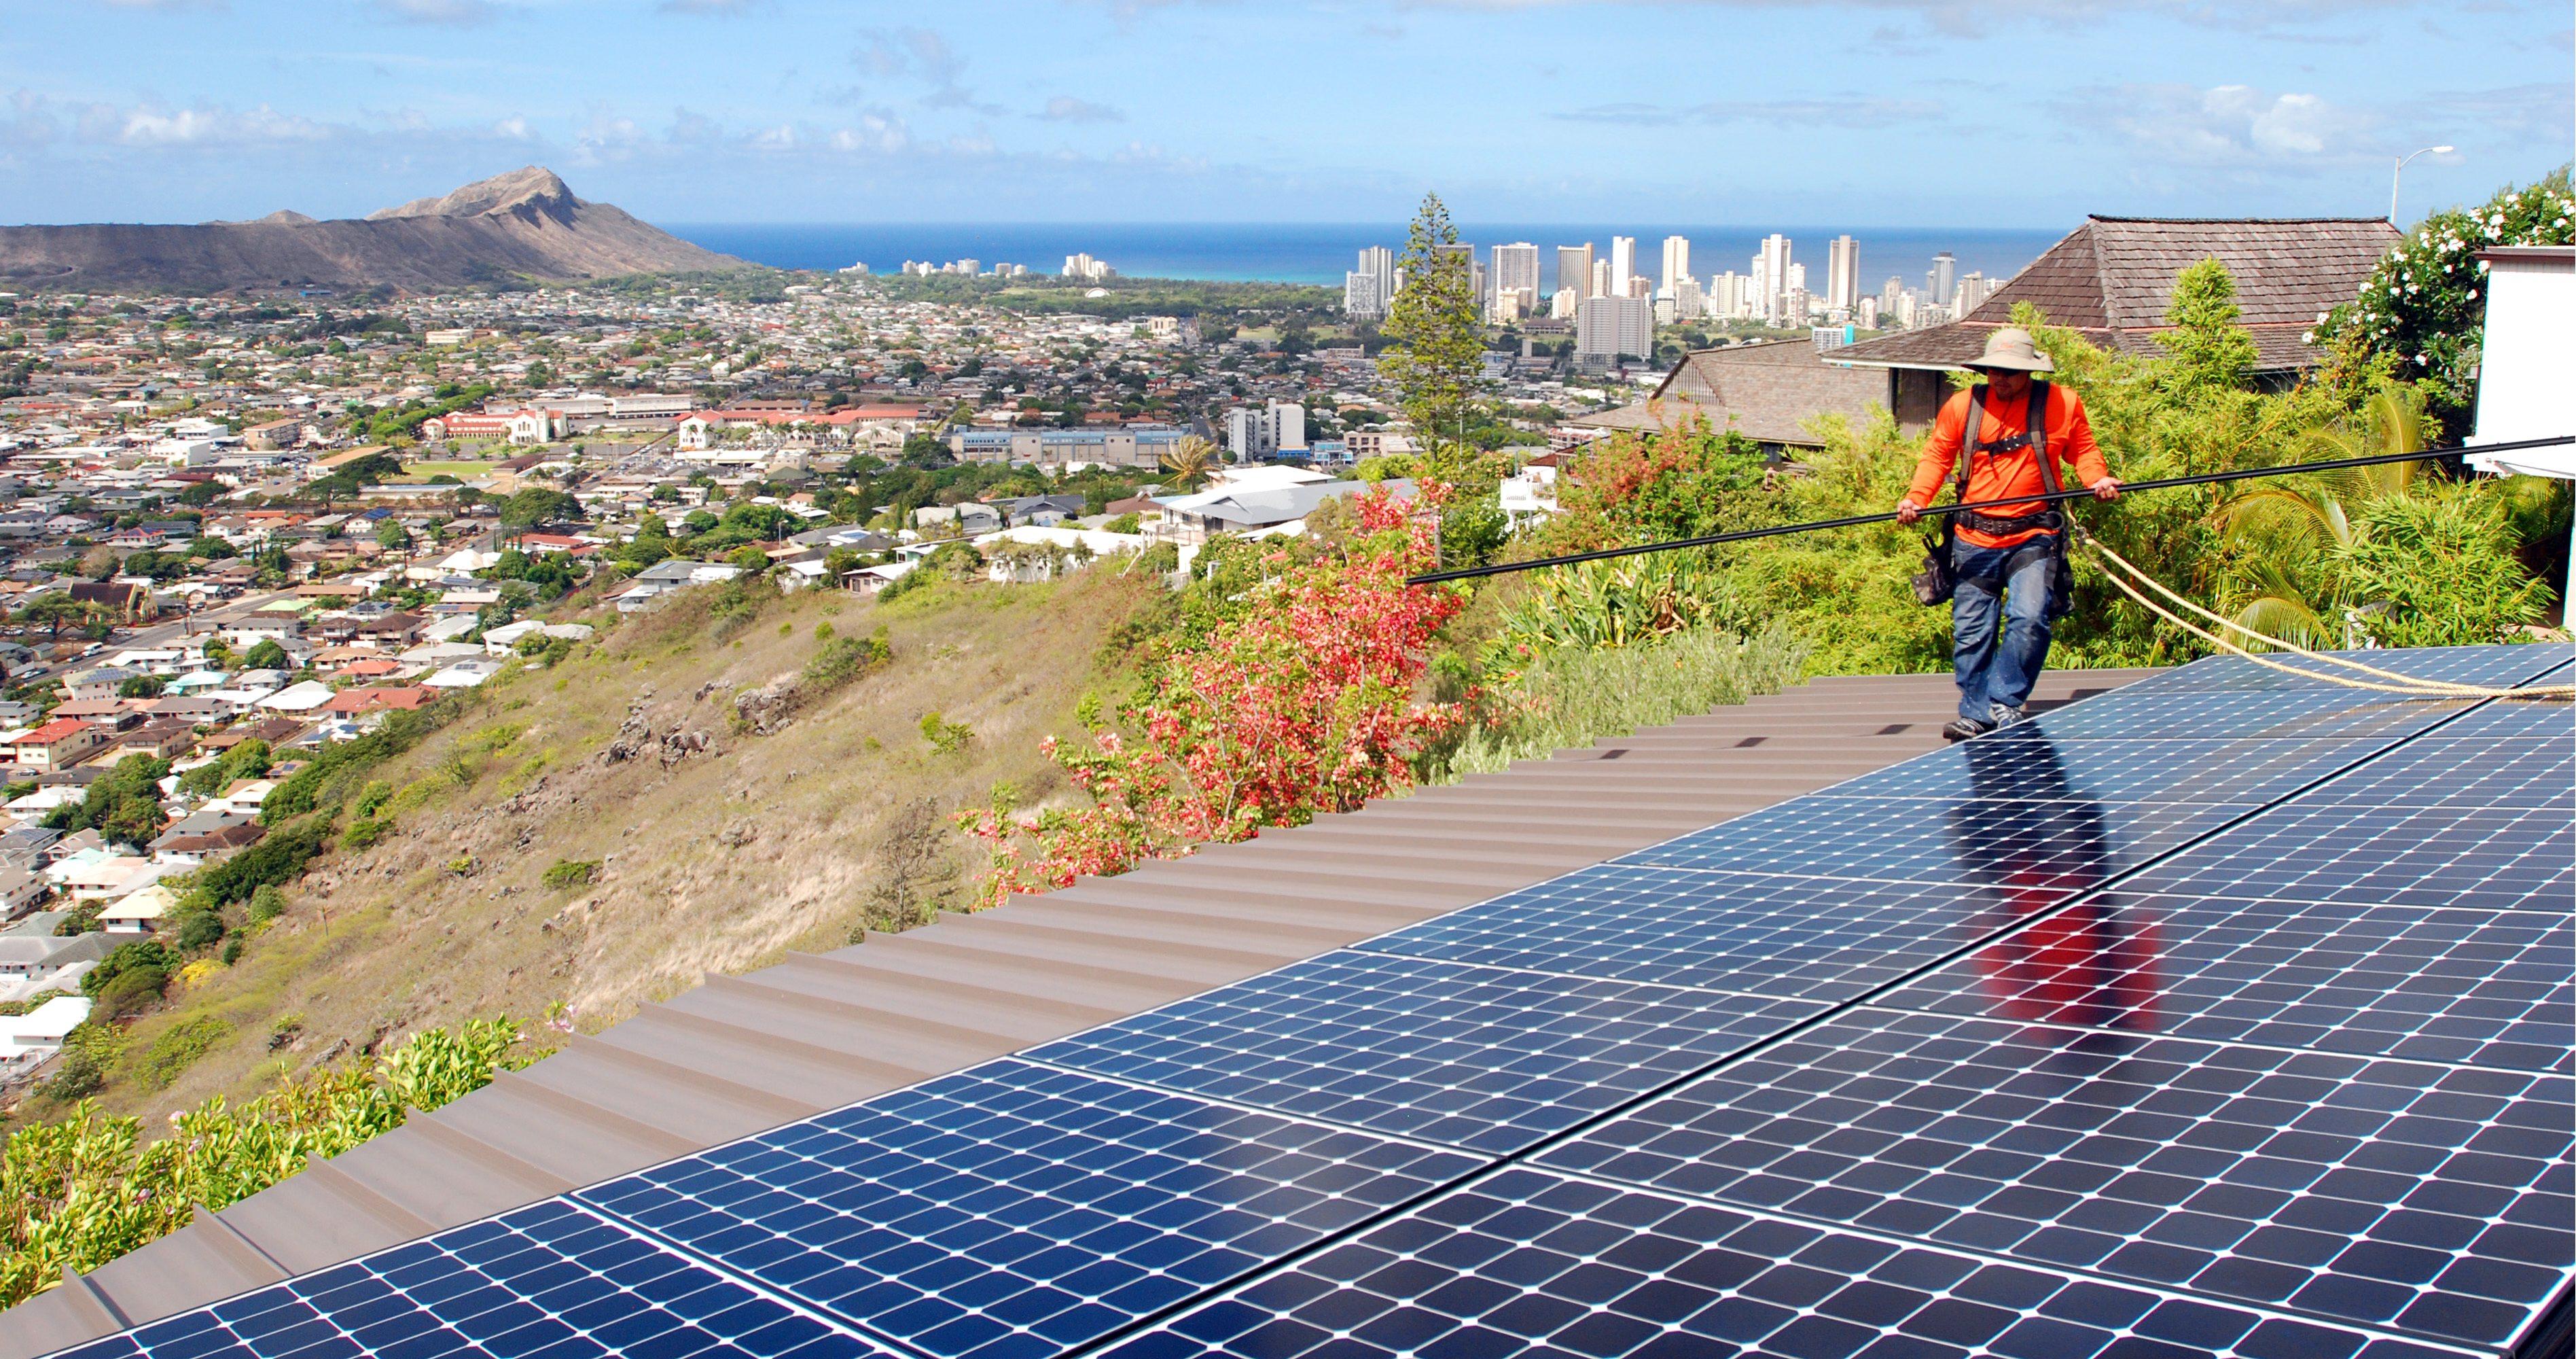 Solar energy usage more than 'sun coast' experience